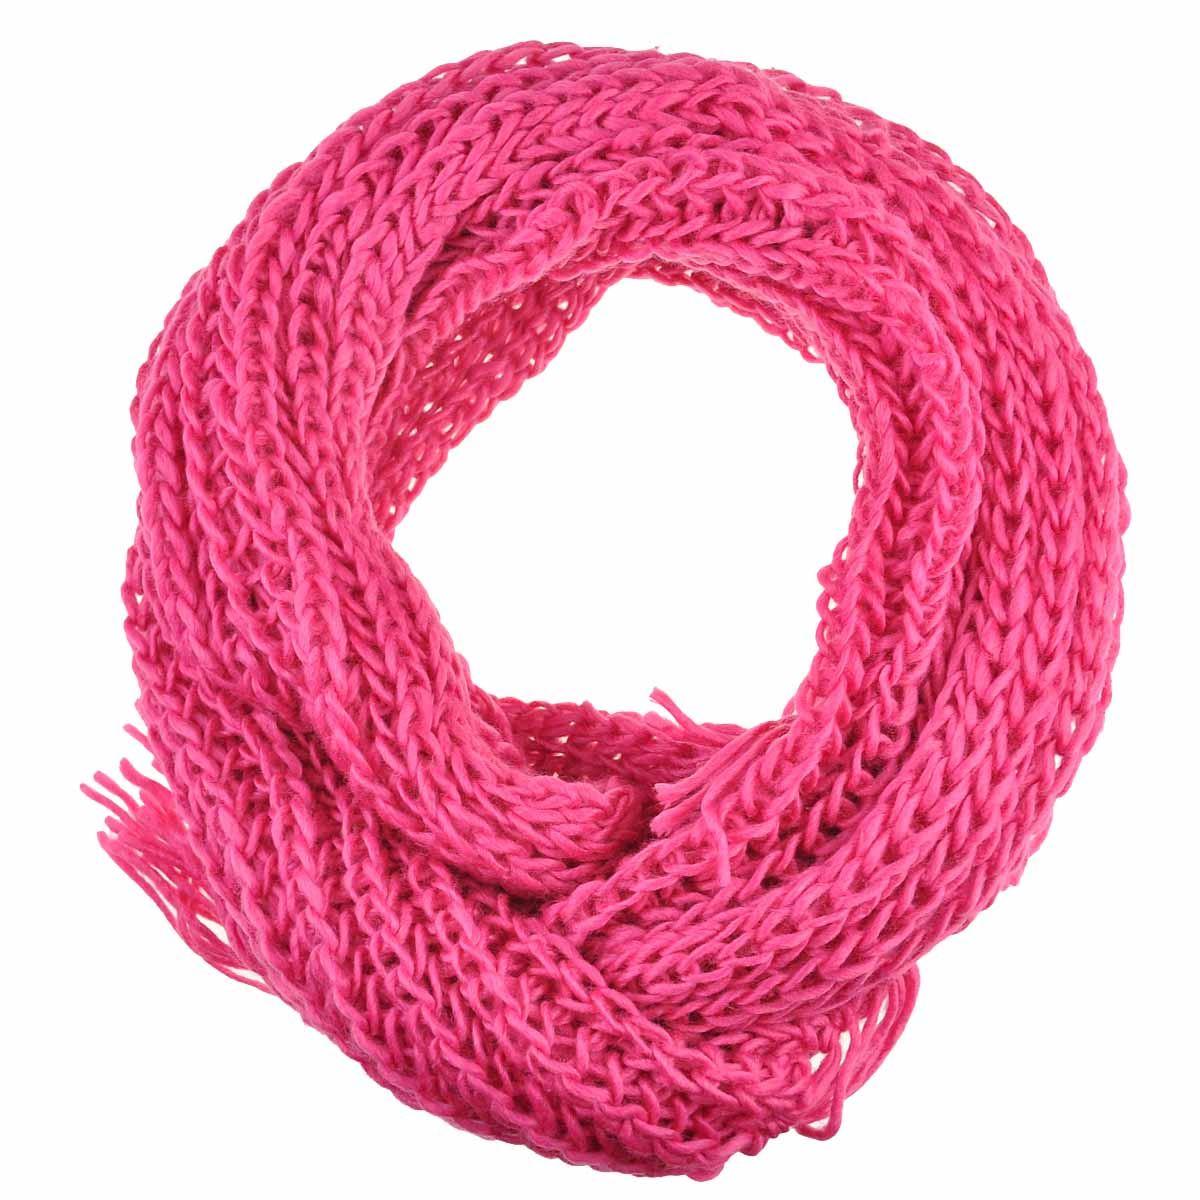 Knitting Chunky Scarf : Women plain knit scarf chunky knitted autumn winter warm